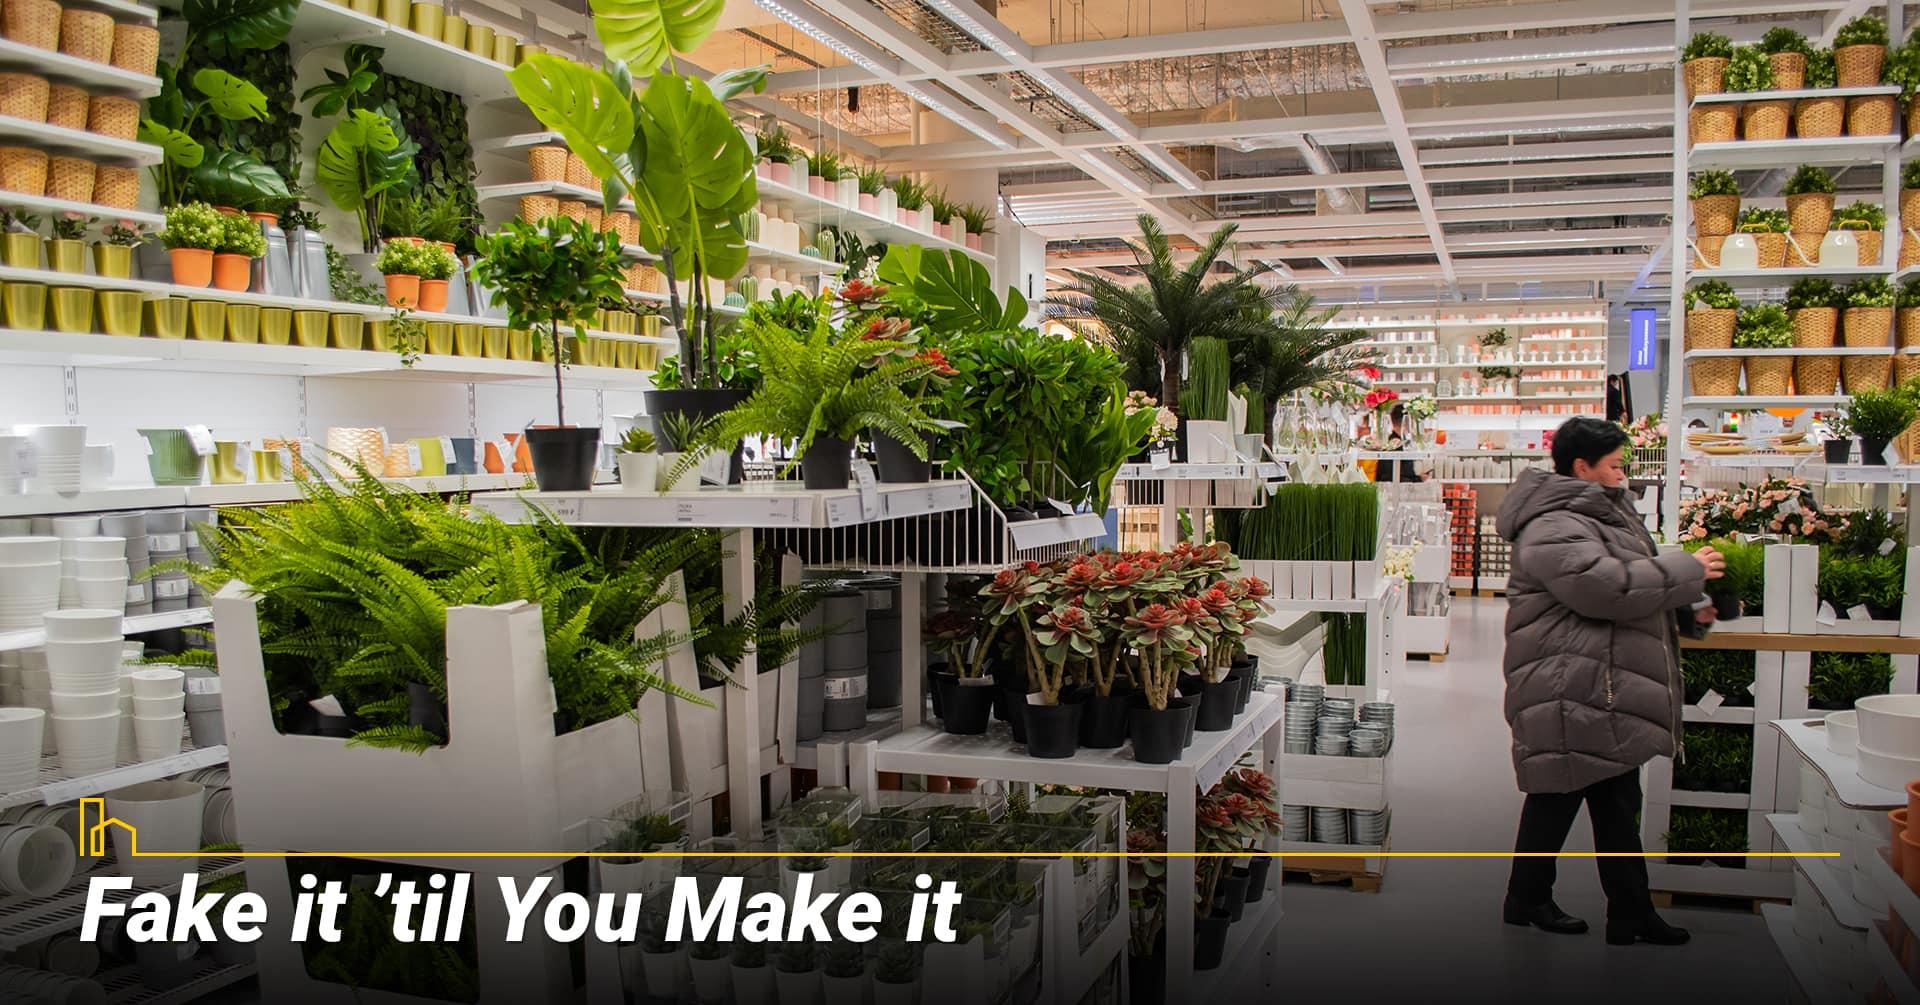 Fake it 'til You Make it, use artificial plants